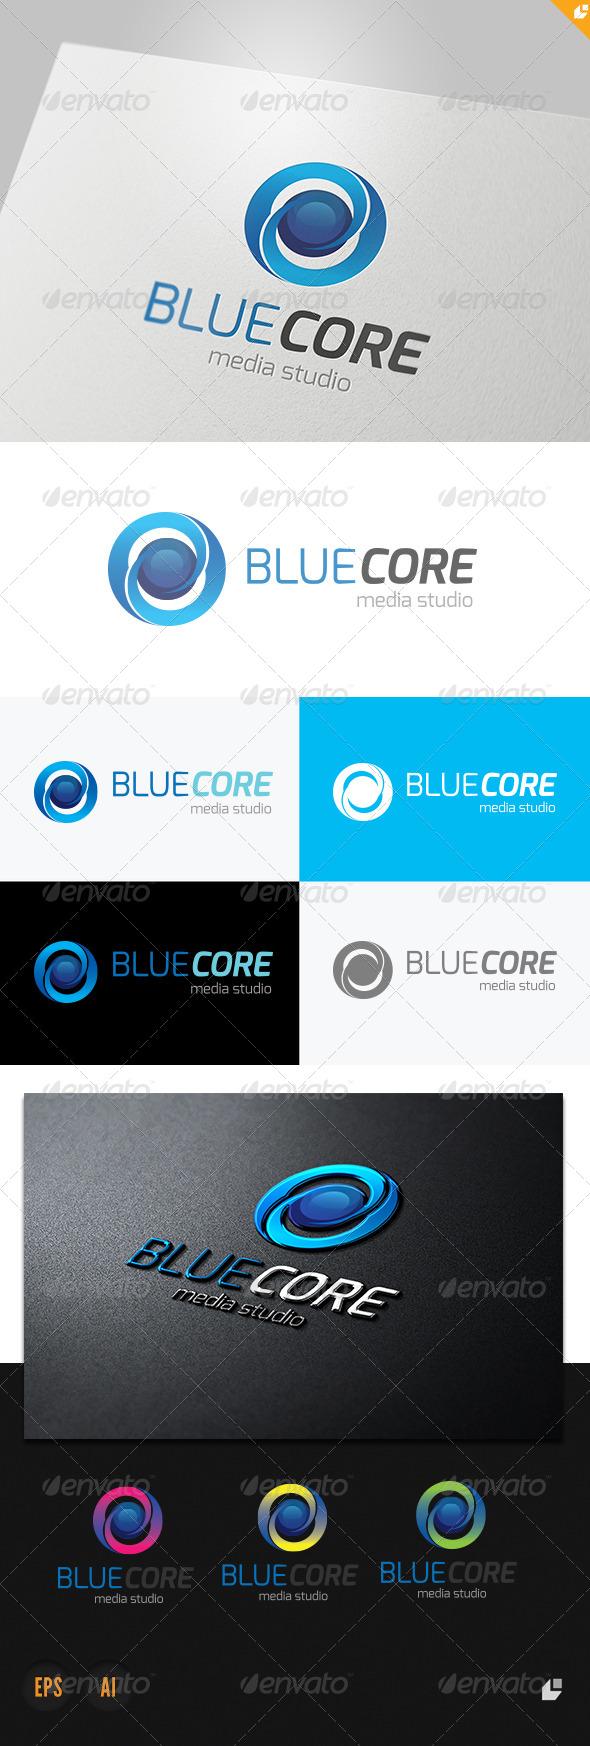 Blue Core Media Studio Logo - 3d Abstract